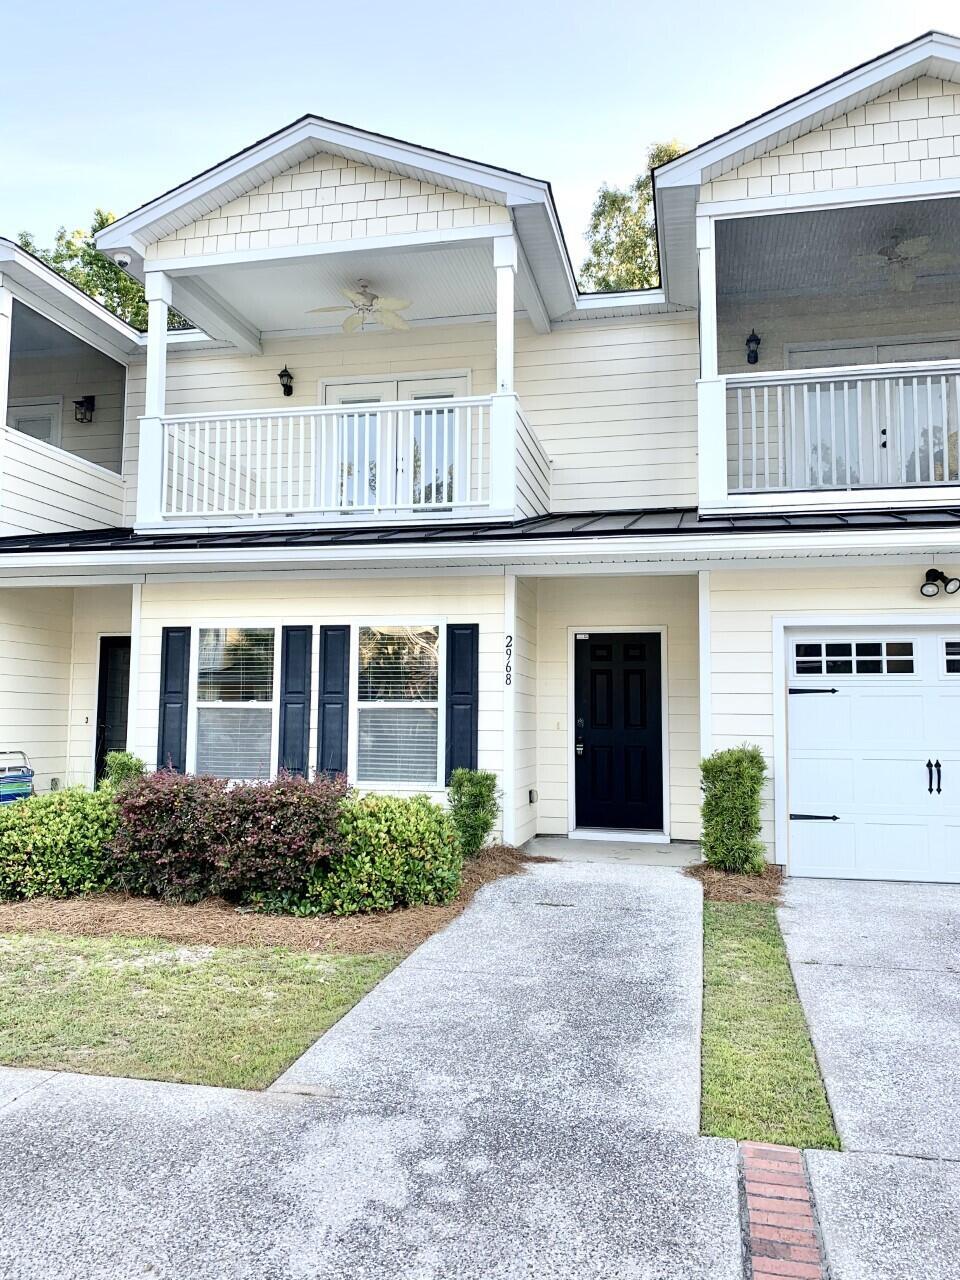 Carol Oaks Town Homes Homes For Sale - 2968 Emma, Mount Pleasant, SC - 8